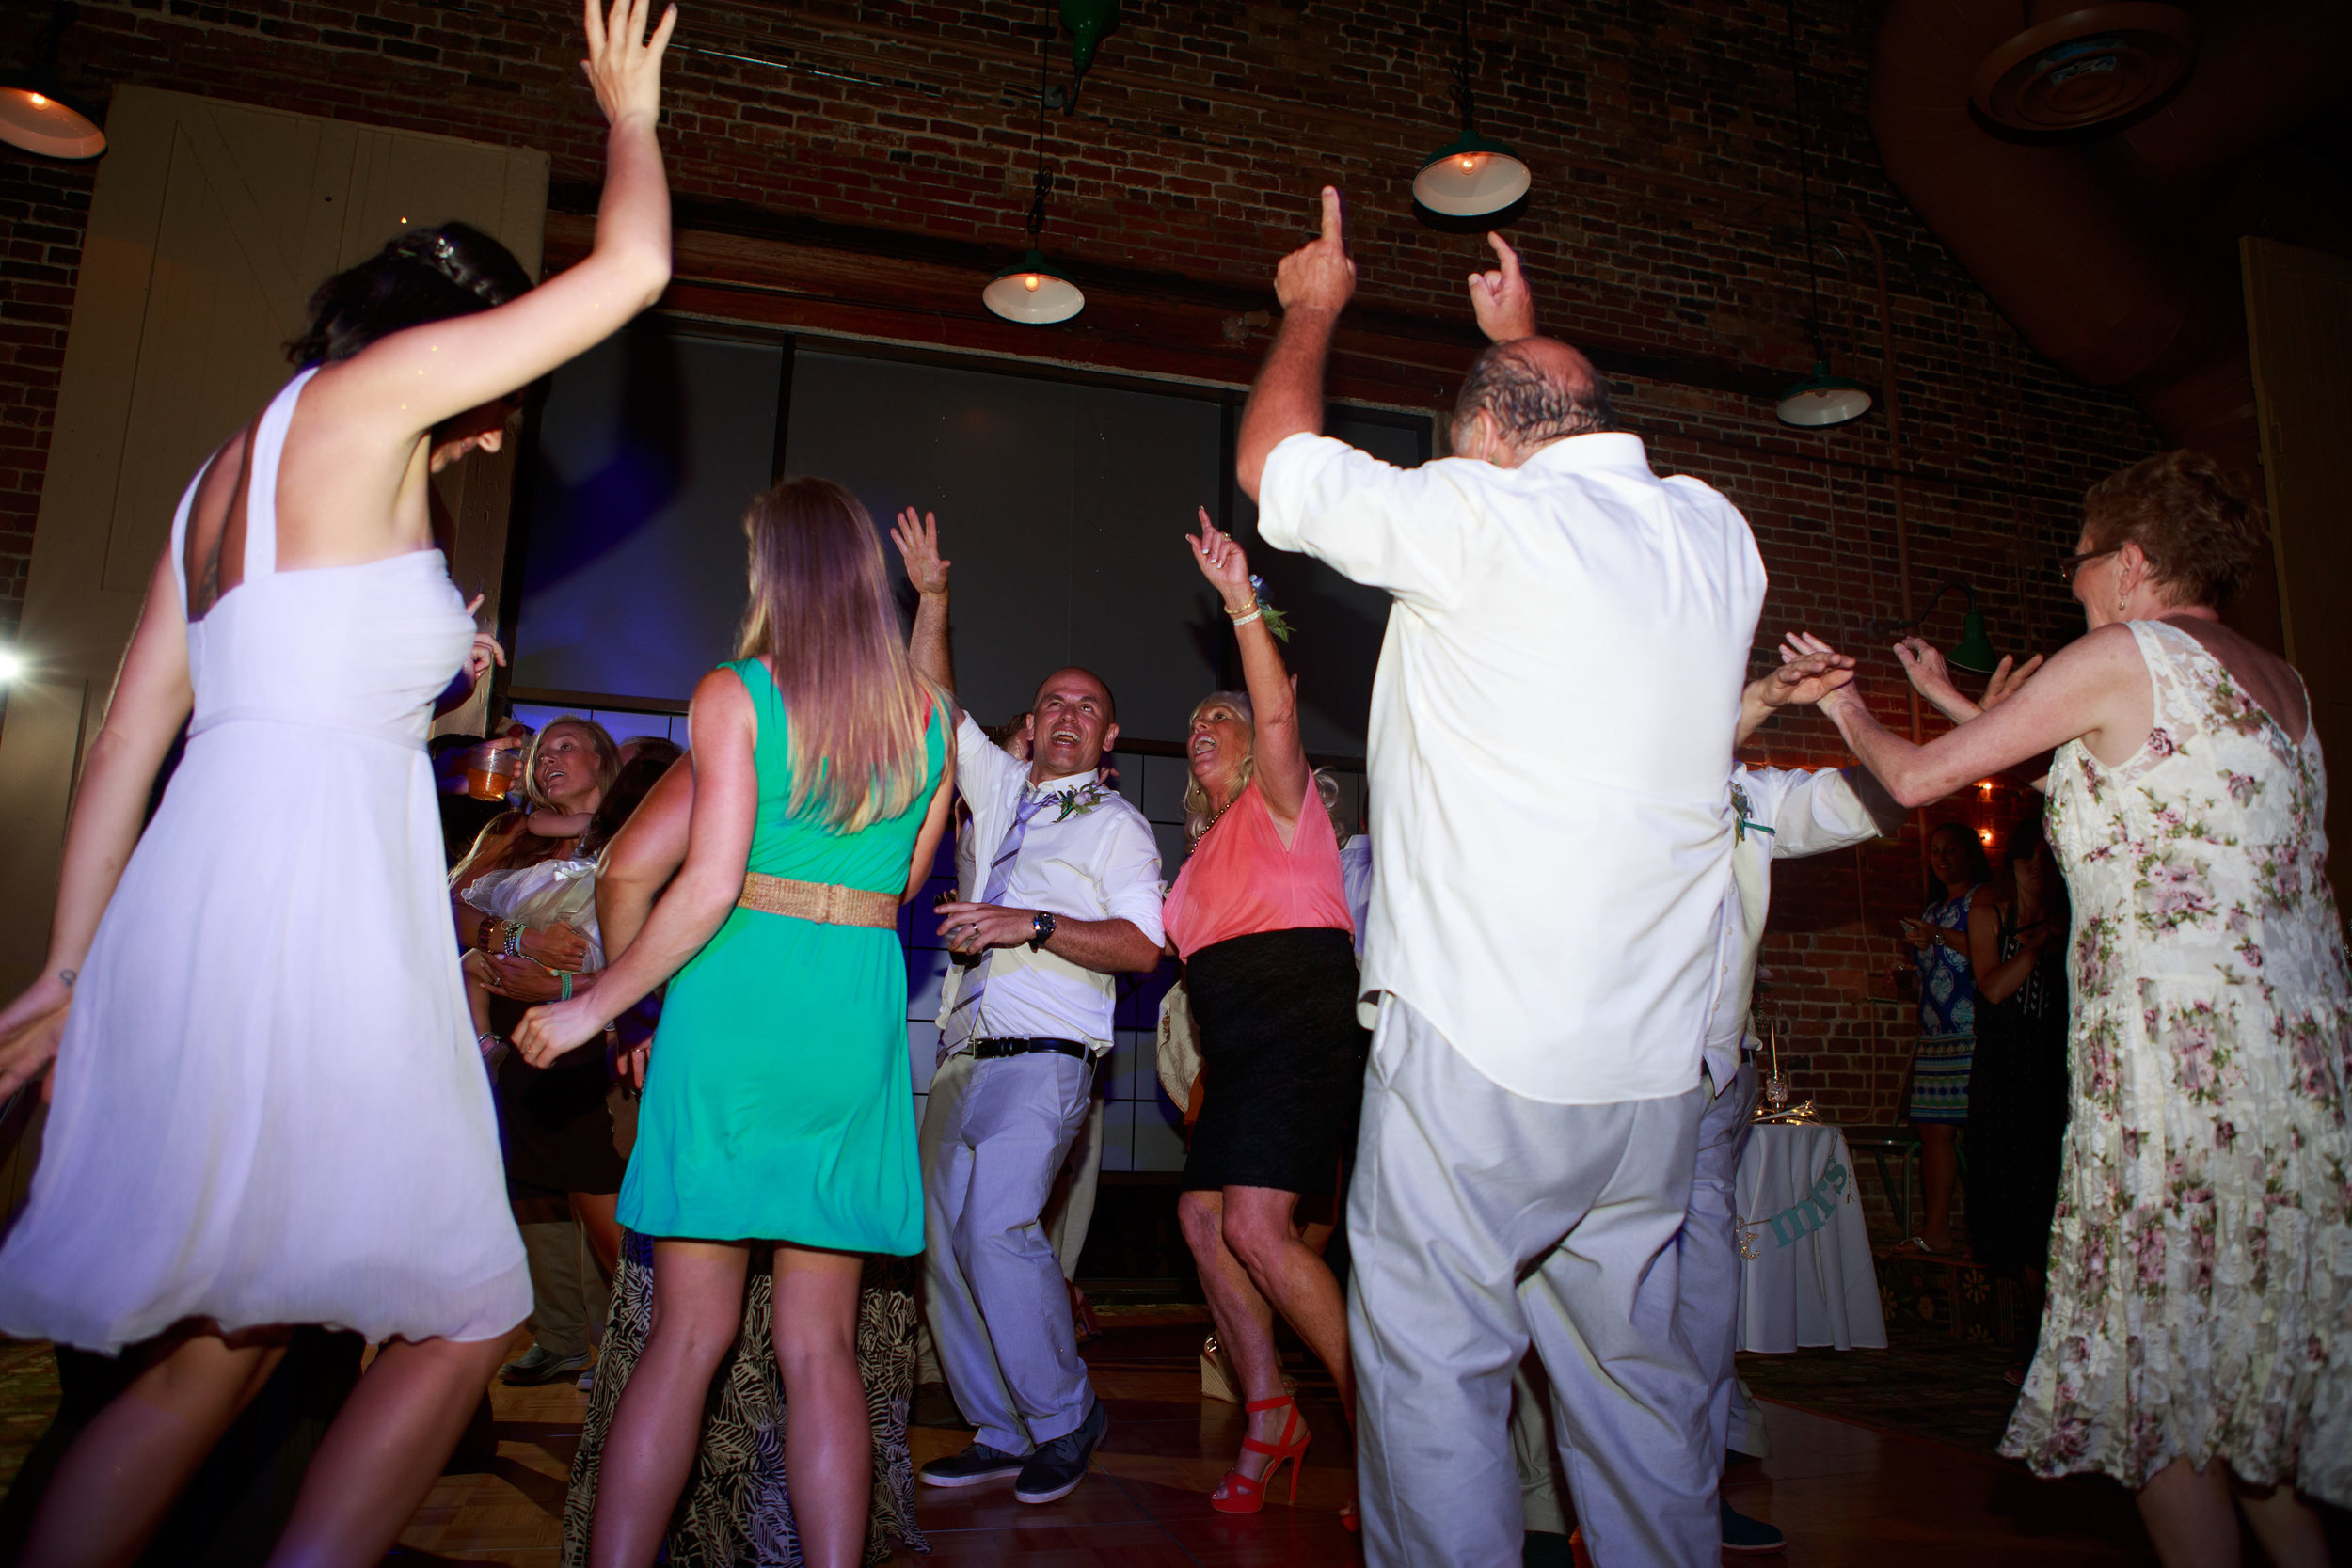 North_Carolina_Wedding_Photographer_Tiffany_Abruzzo_Reception_247.jpg